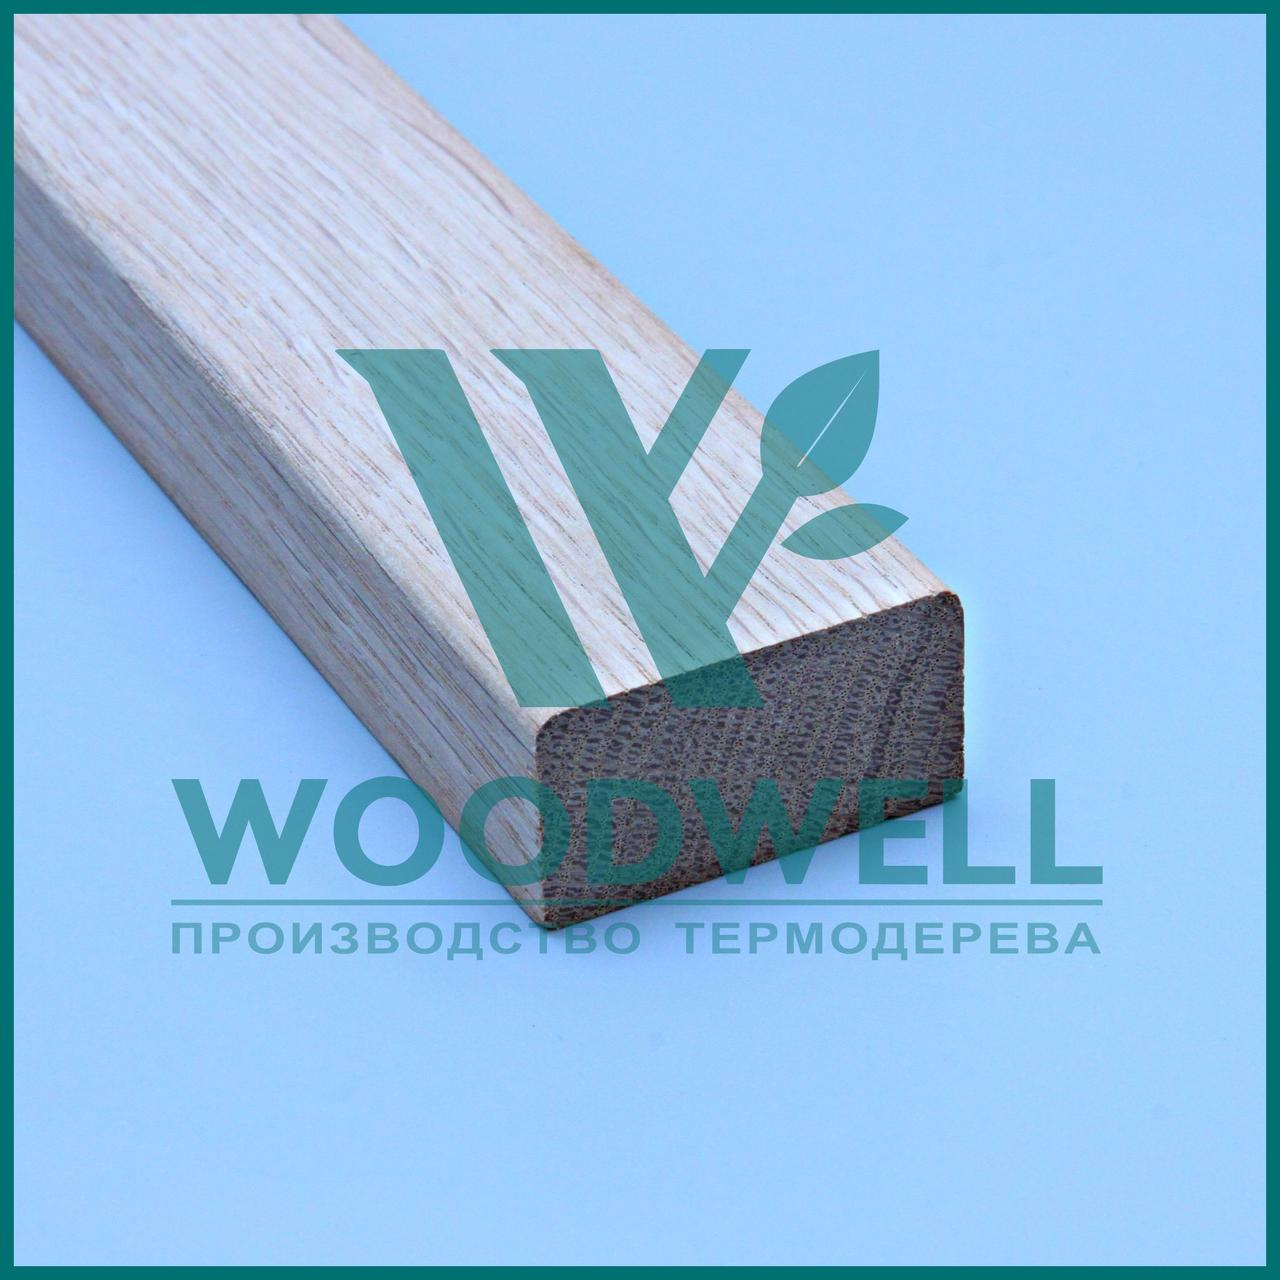 Декор рейка дуб - брус Дуб - Woodwell